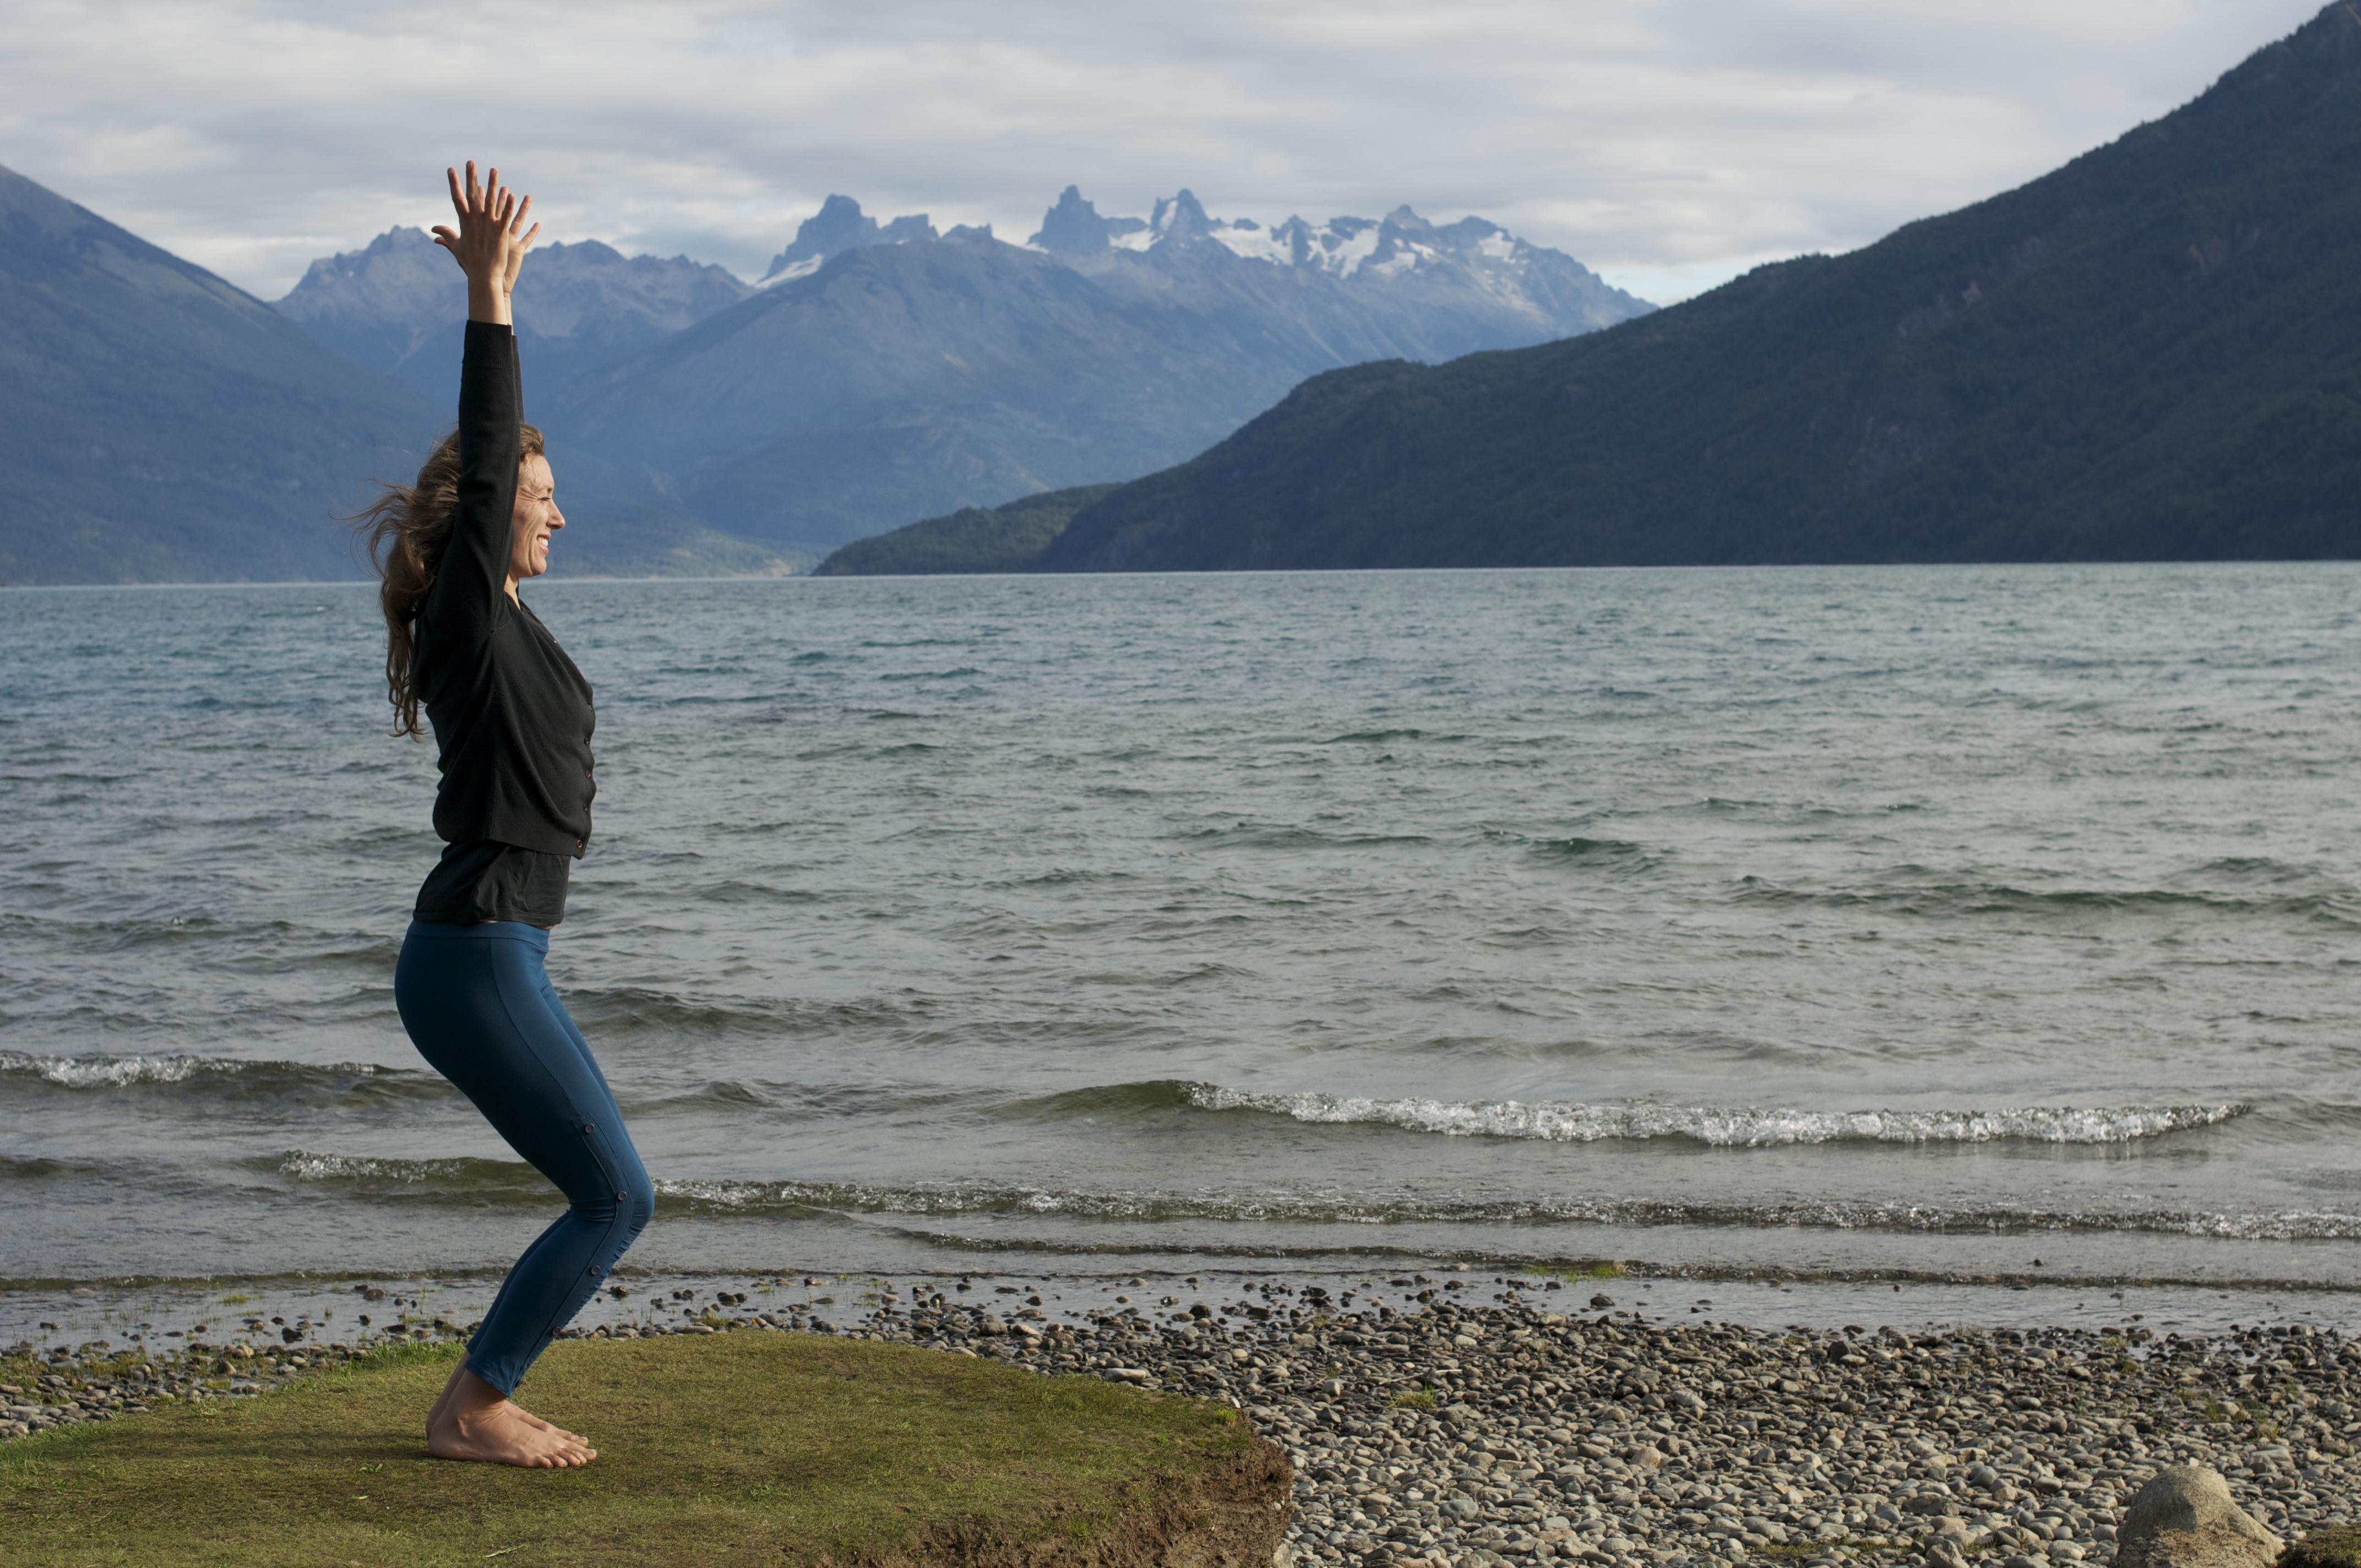 2012_03_13+Chloe++Yoga+Lago+Puelo+(12).jpg